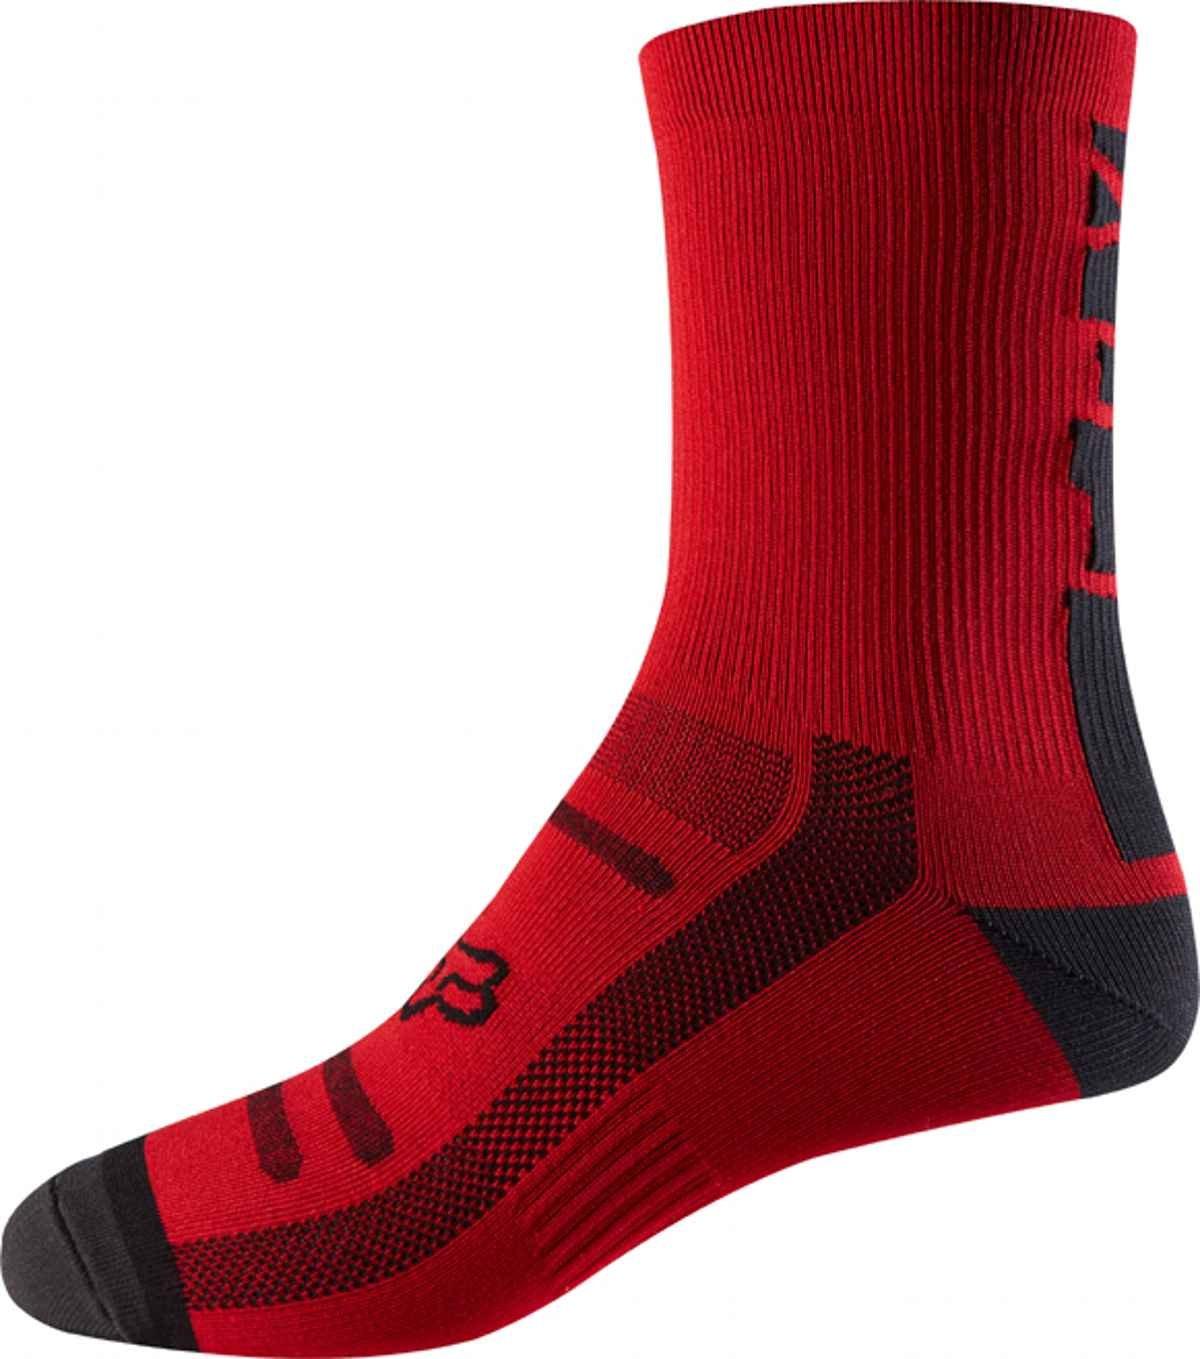 Fox Light Indigo 2018 Trail - 8 inch MTB Socks